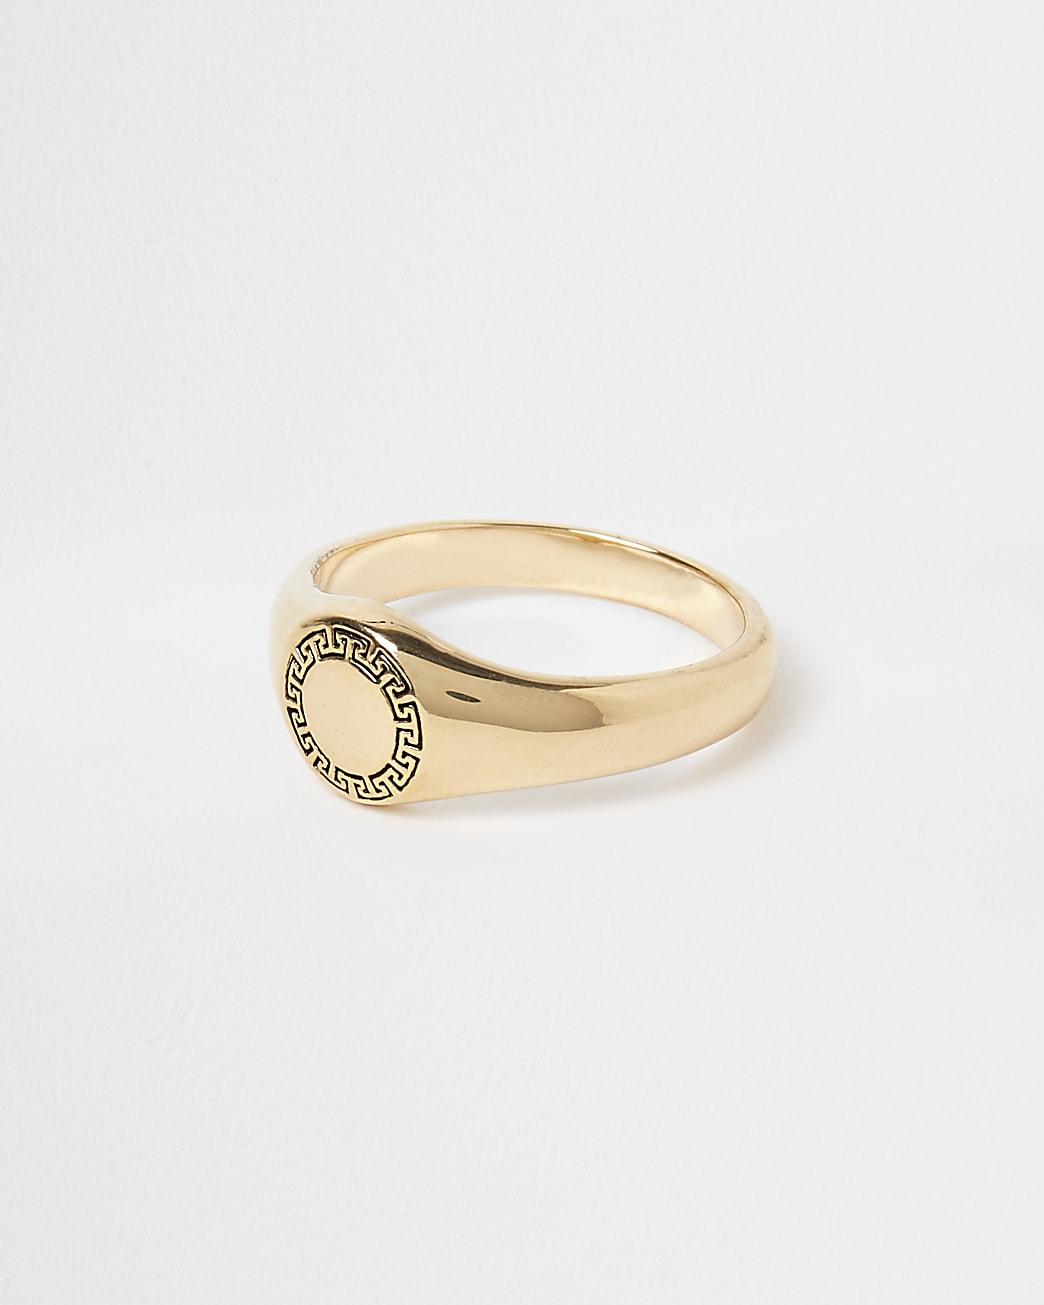 Gold plated Greek key signet ring